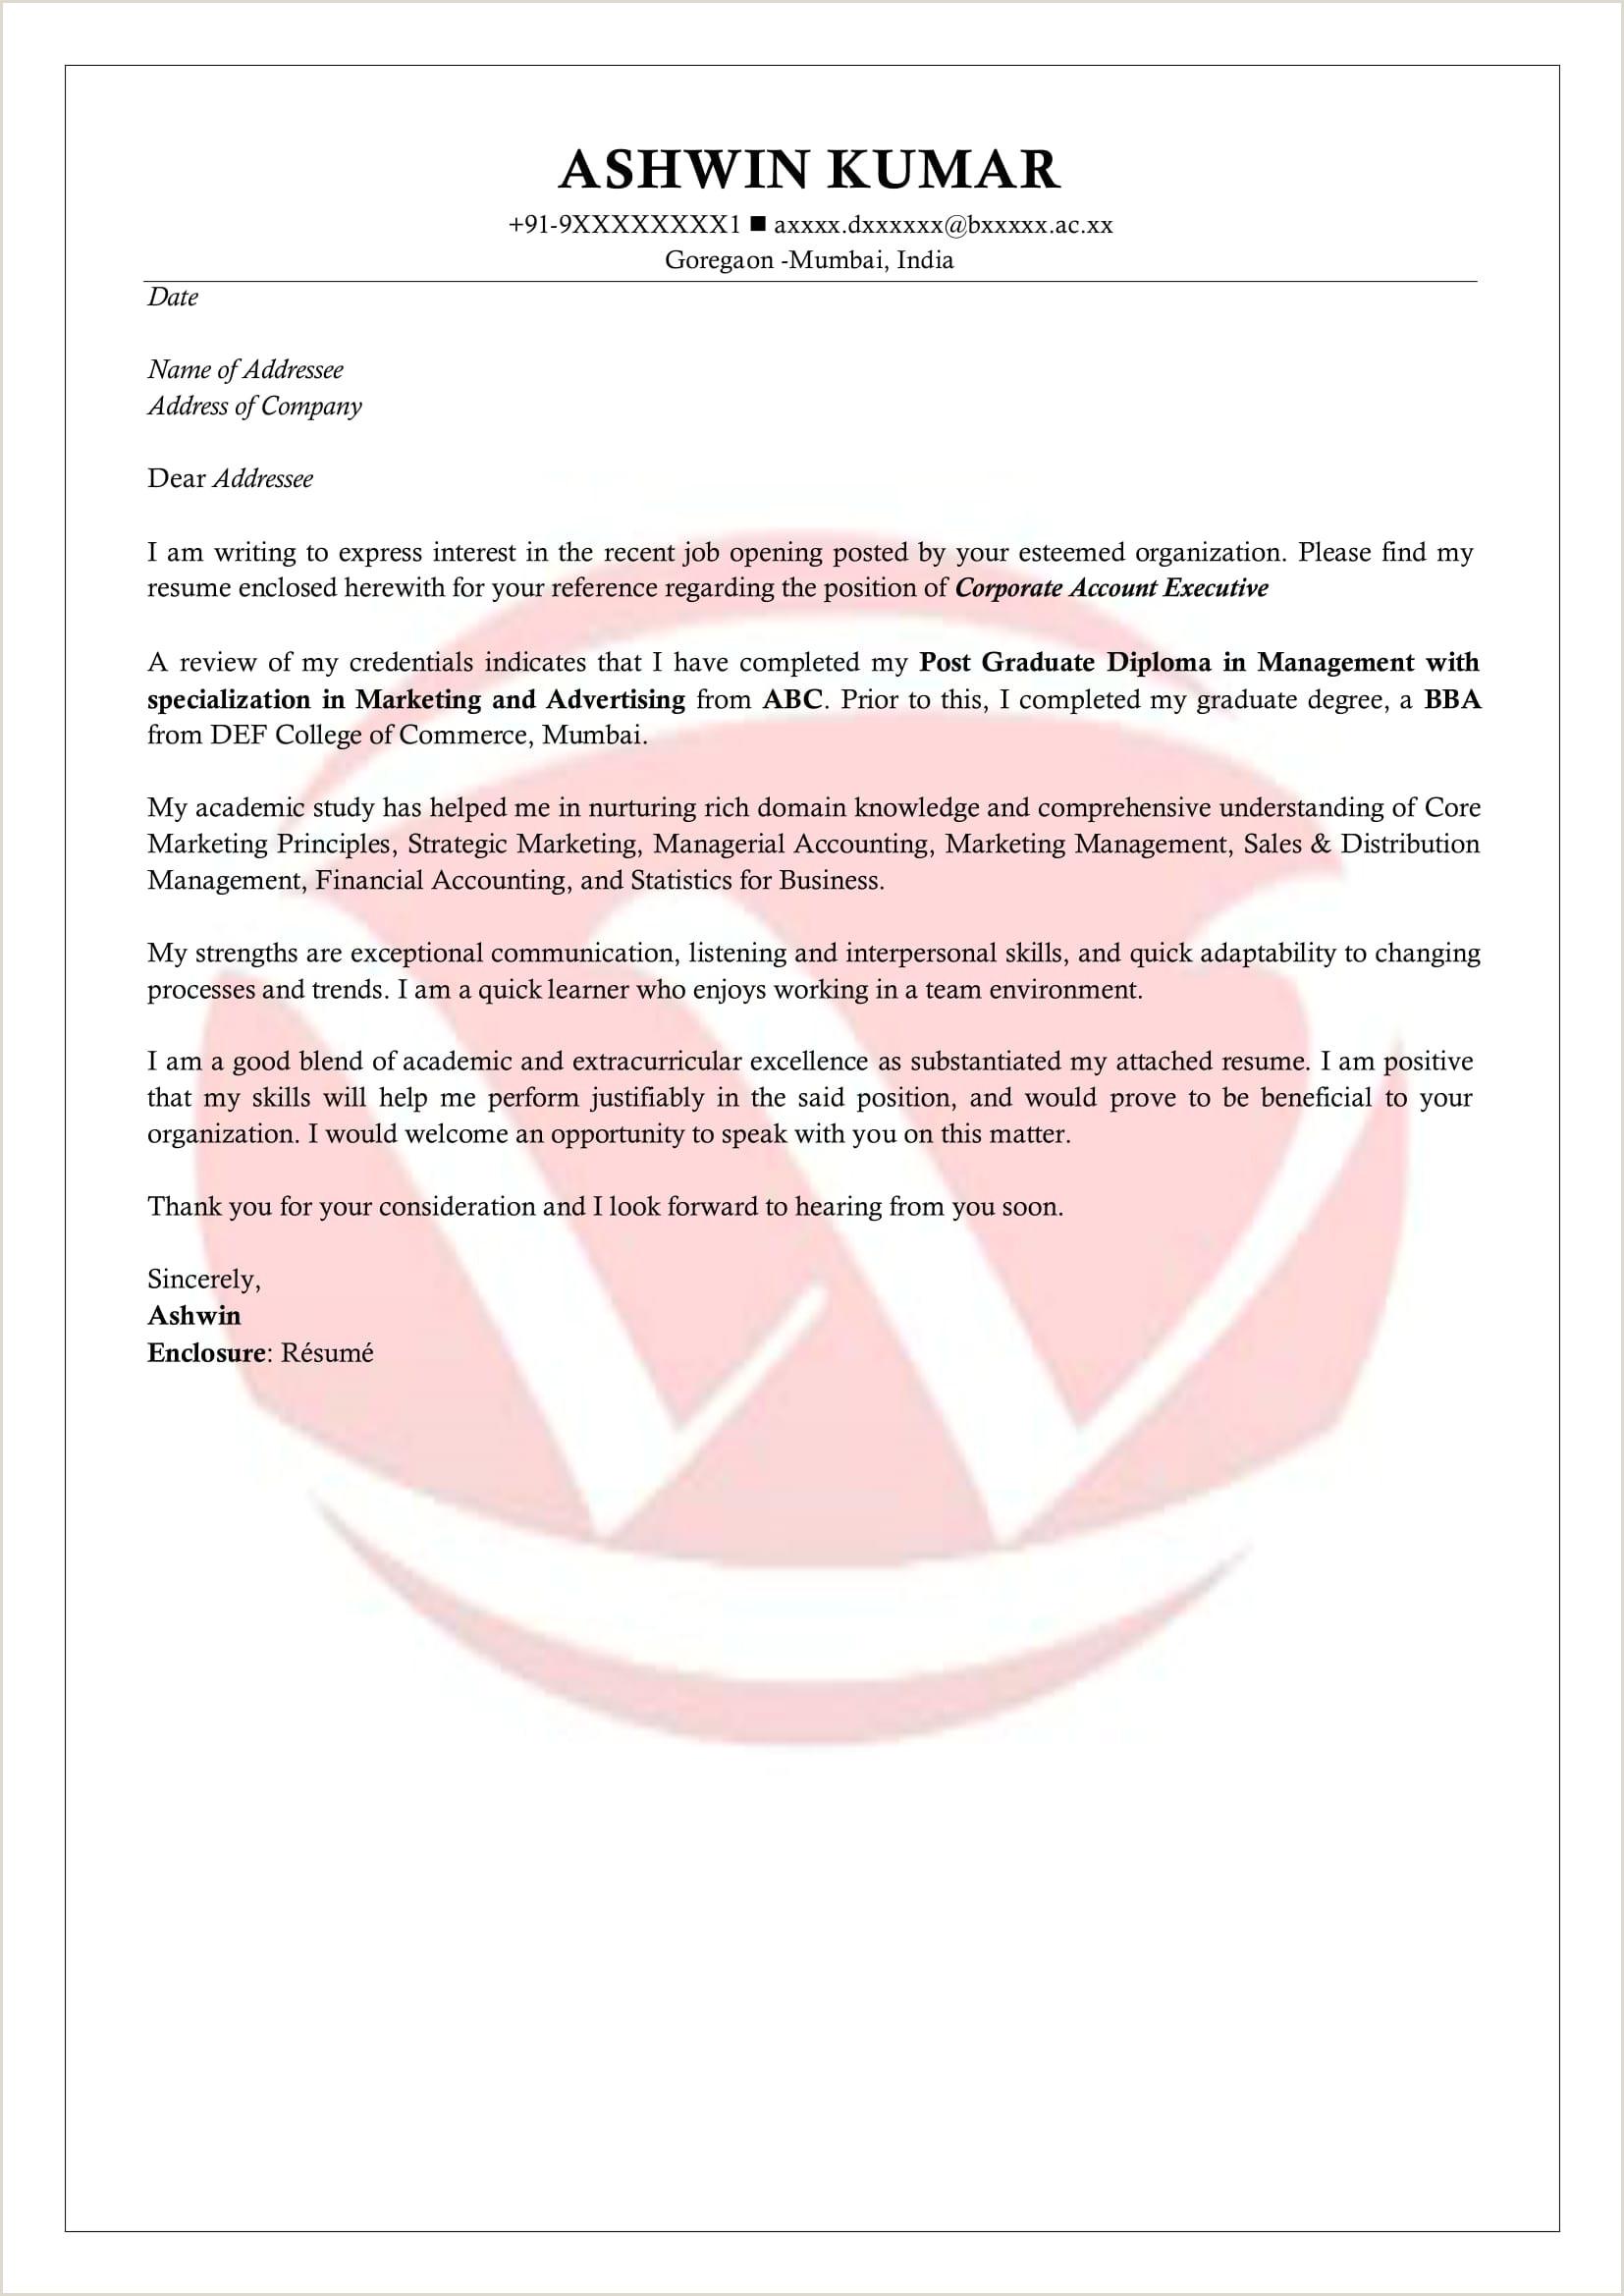 Freshers Sample Cover Letter Format Download Cover Letter